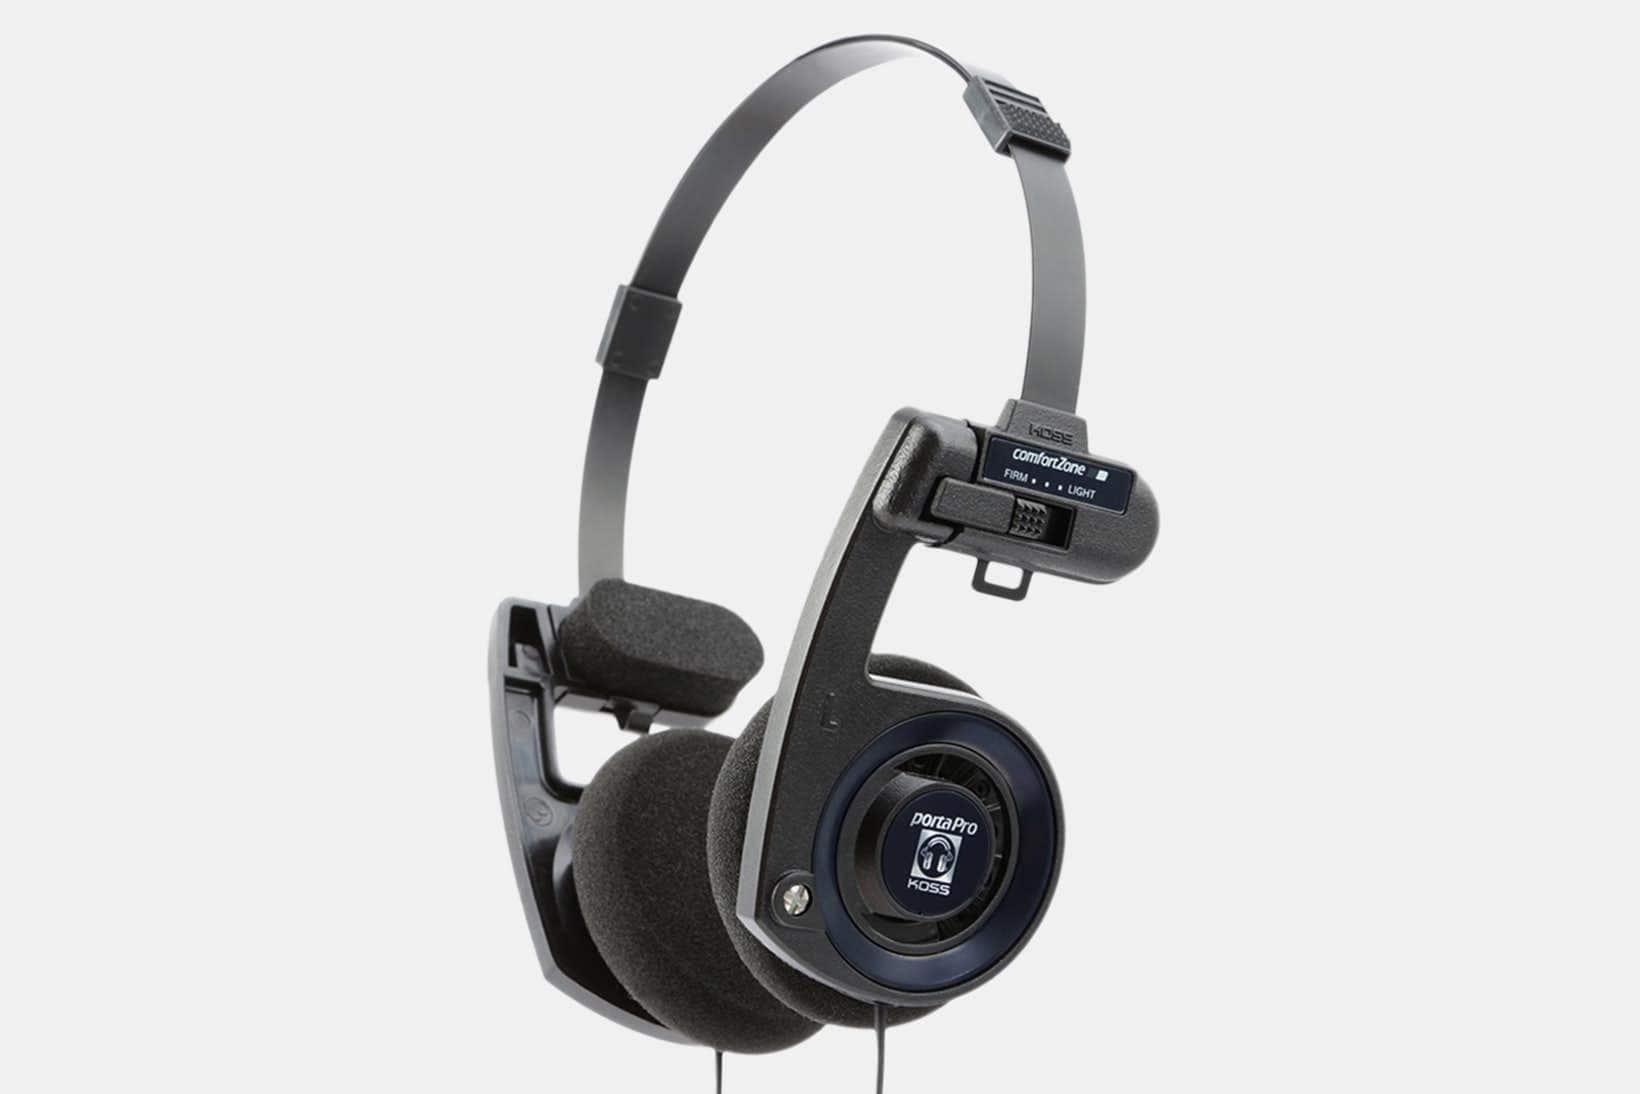 Massdrop X Koss Porta Pro X Headphones Limited Edition Black $19.60 + Free Shipping